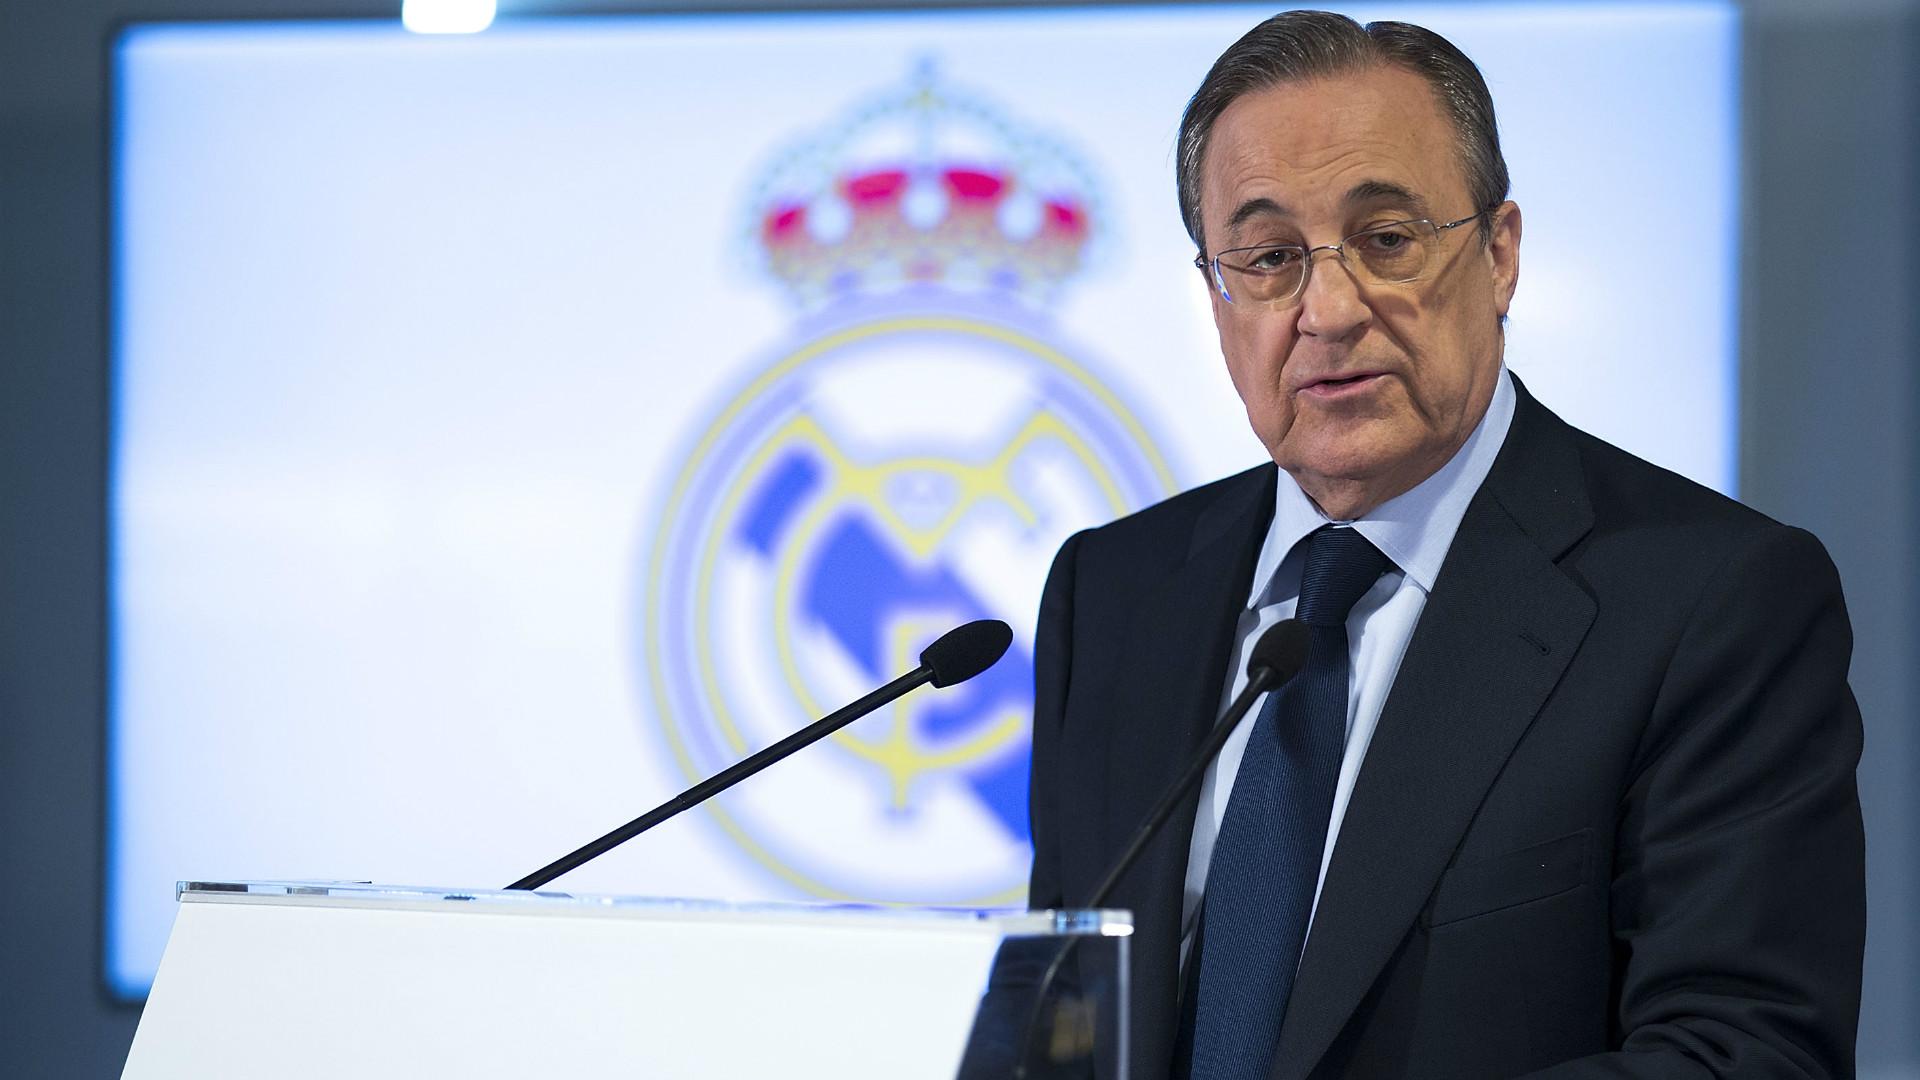 Florentino Perez Cristiano Ronaldo Real Madrid record goal scorer